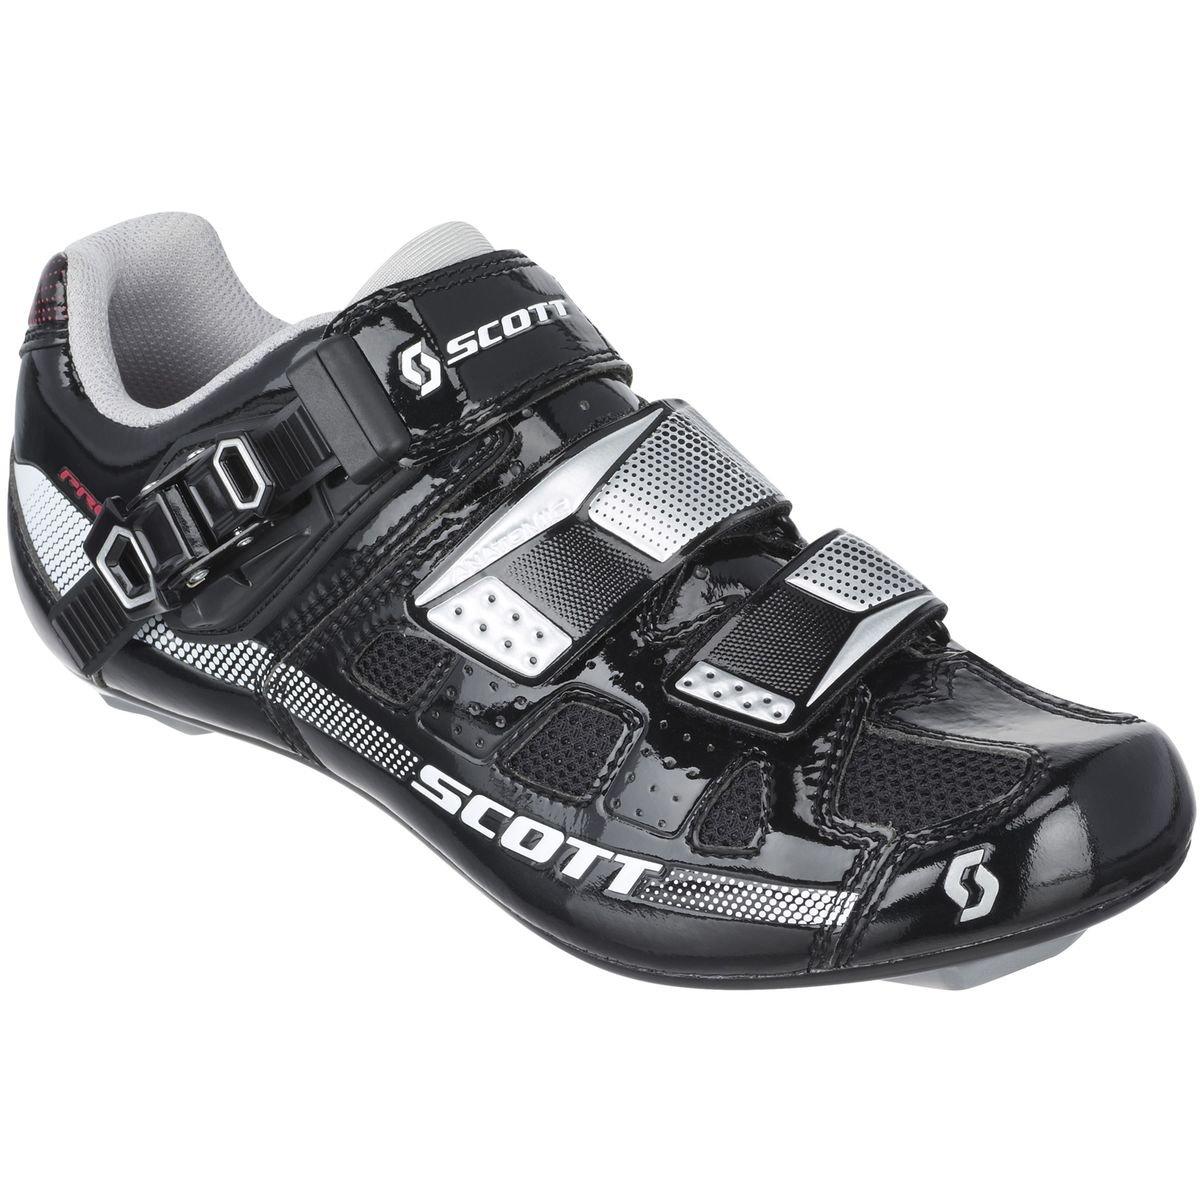 Scott Sports 2016 Women's Pro Road Cycling Shoe - 242137-4314 (black/white gloss - 38.0)